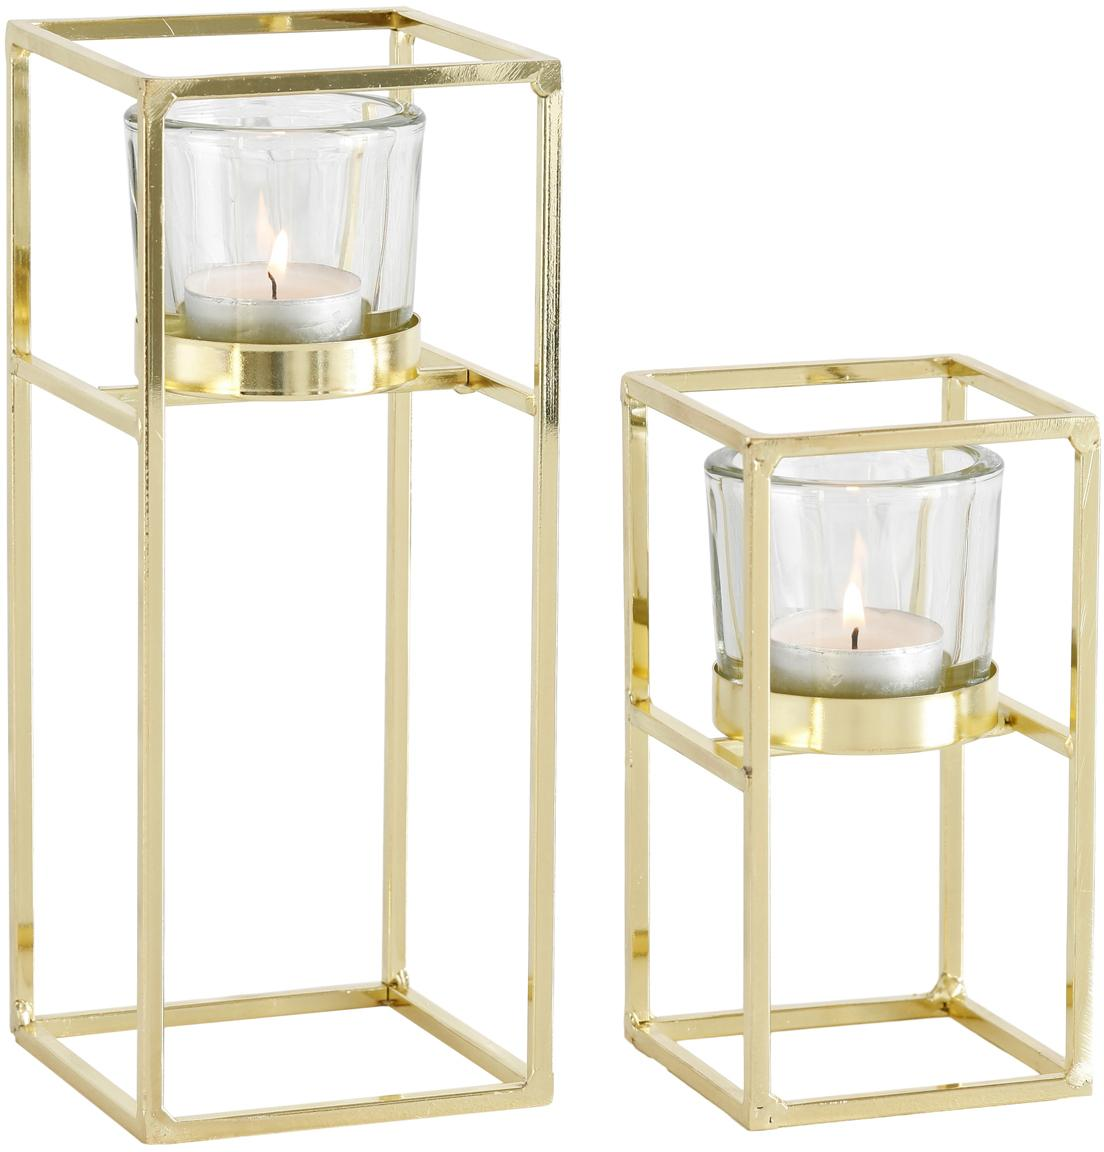 Set de portavelas Tonia, 2pzas., Portavelas: vidrio, Estructura: metal recubierto, Transparente, latón, Set de diferentes tamaños